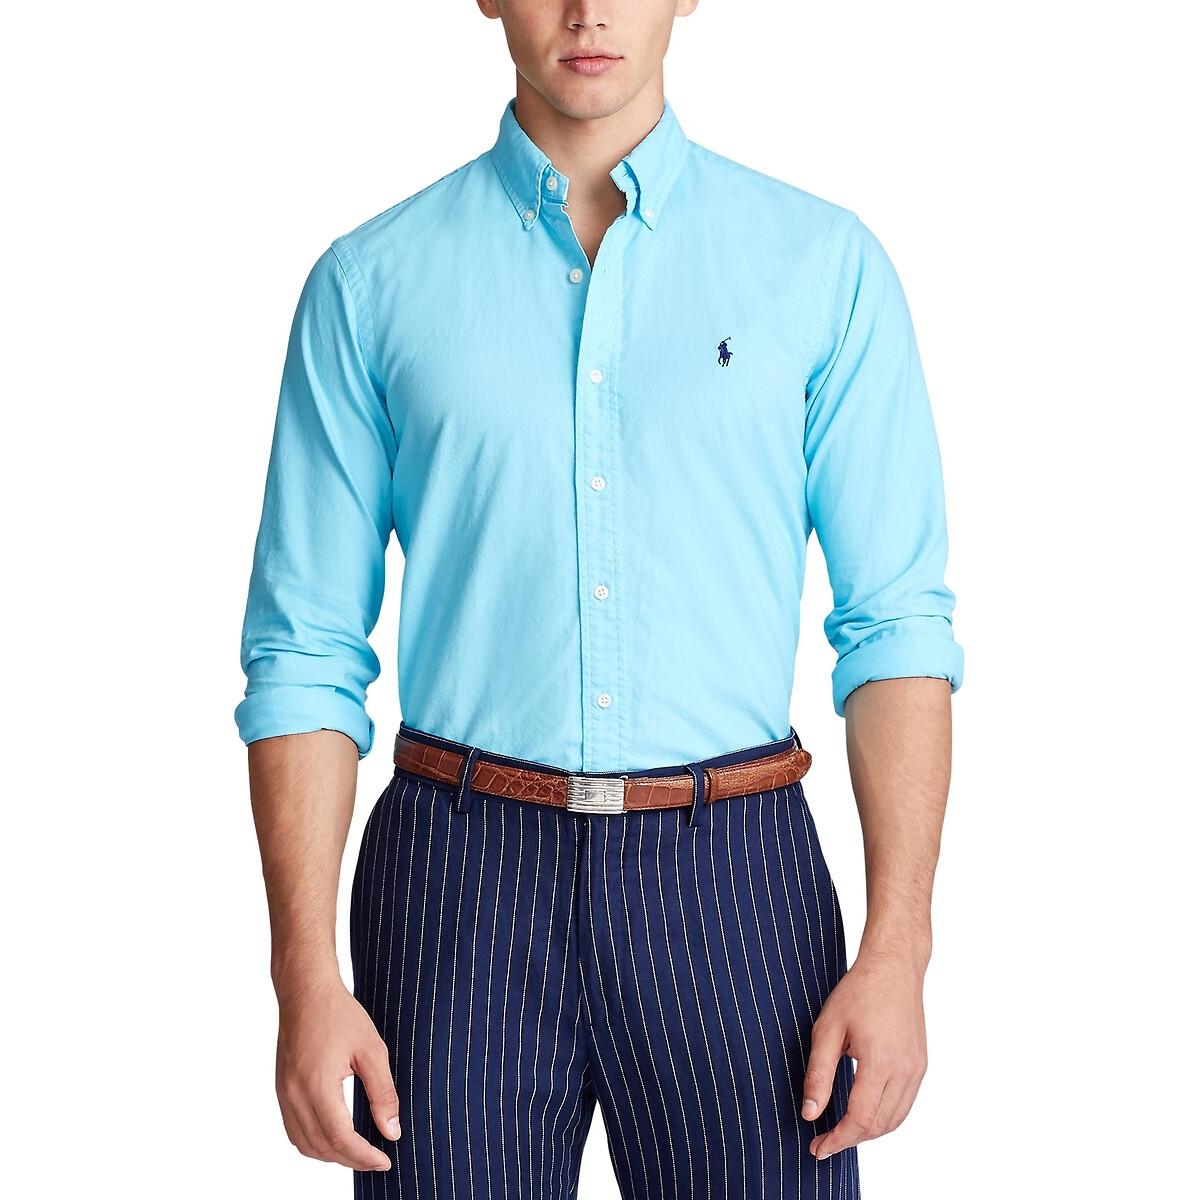 Рубашка La Redoute Узкого покроя из ткани оксфорд L синий рубашка la redoute из ткани оксфорд 16 лет 162 см синий